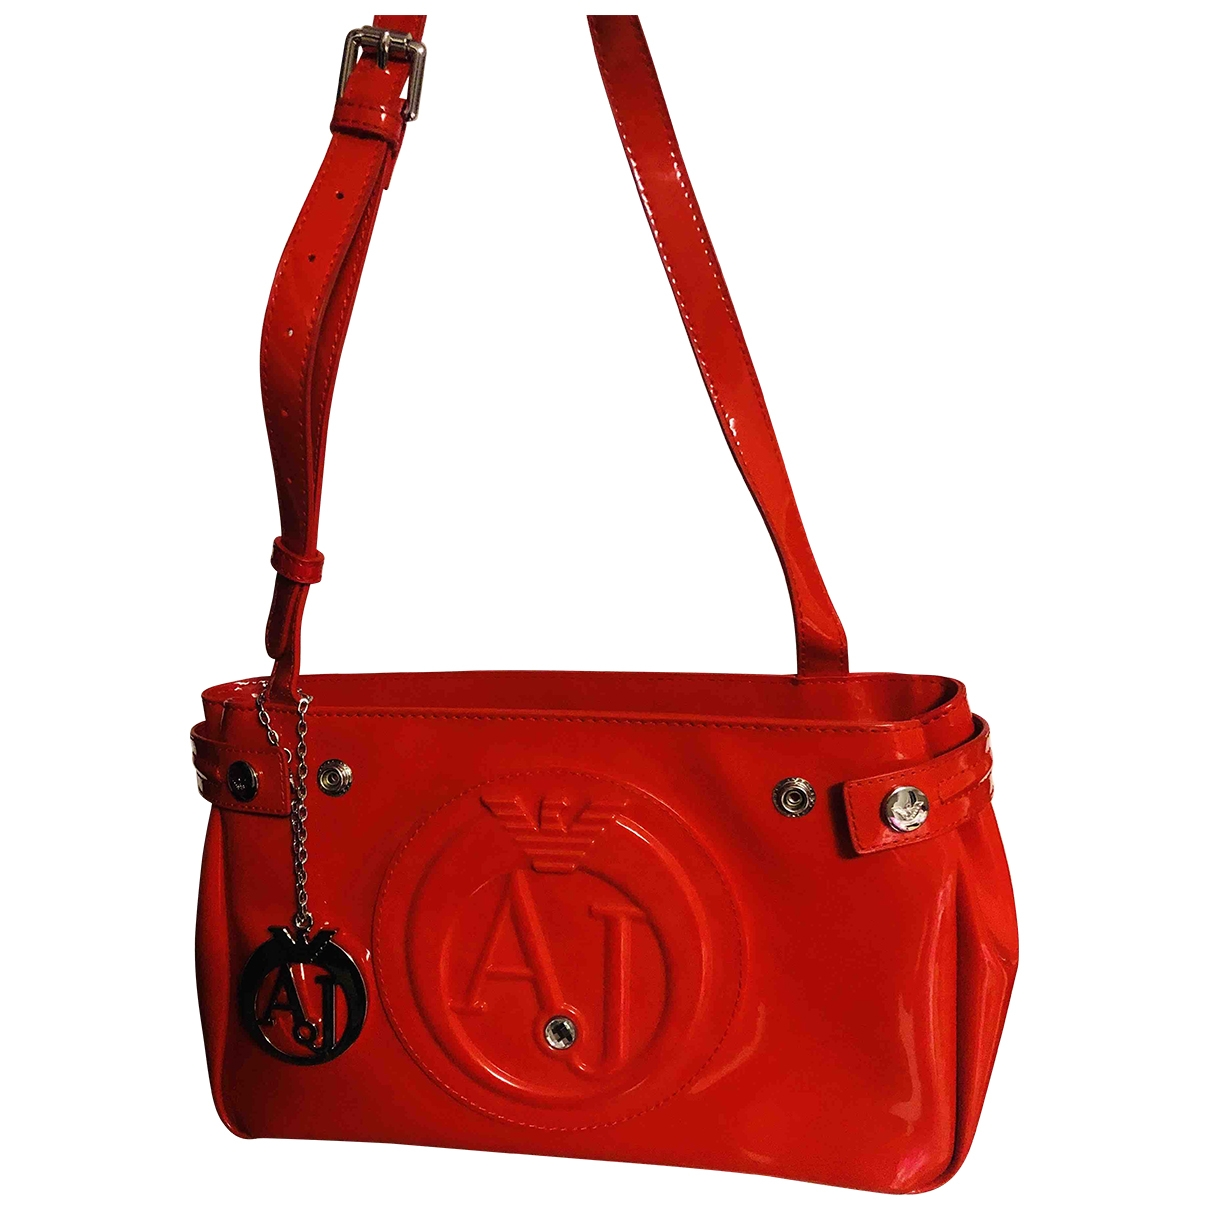 Armani Jeans \N Red Clutch bag for Women \N